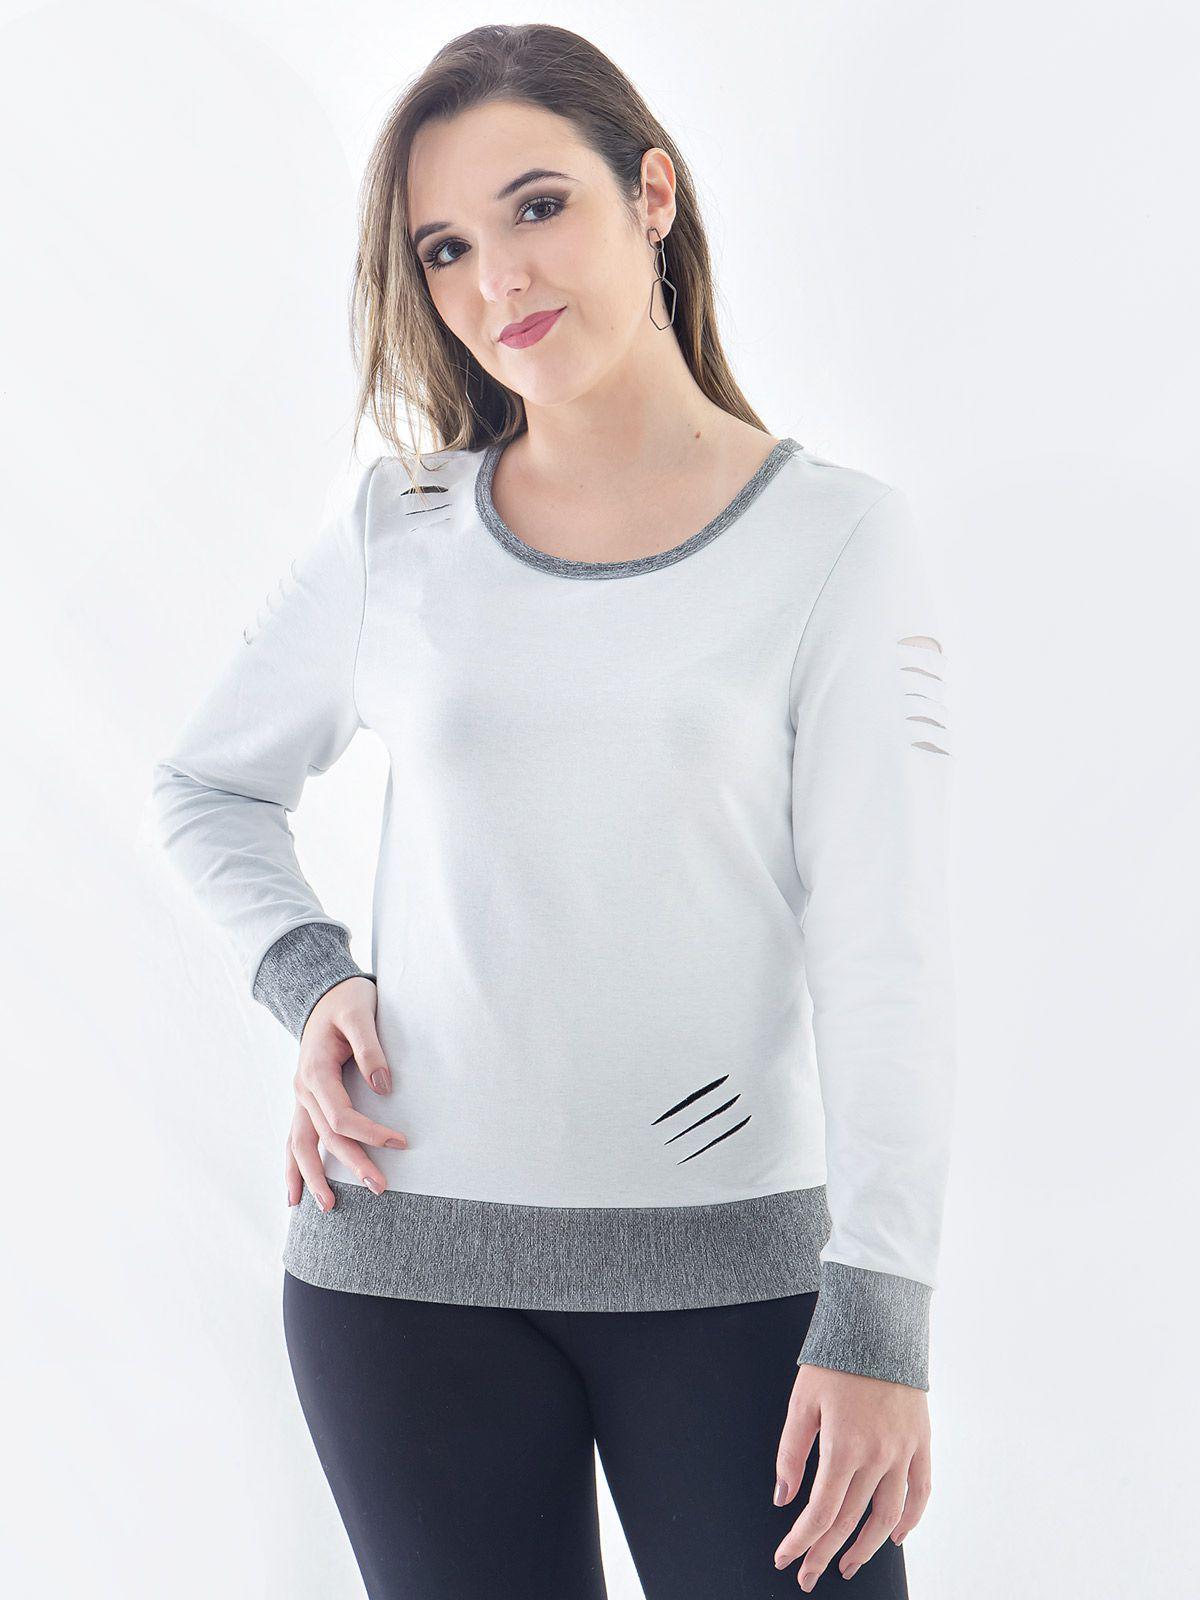 Blusa Moletom Feminina Corte A Laser Anistia Branca